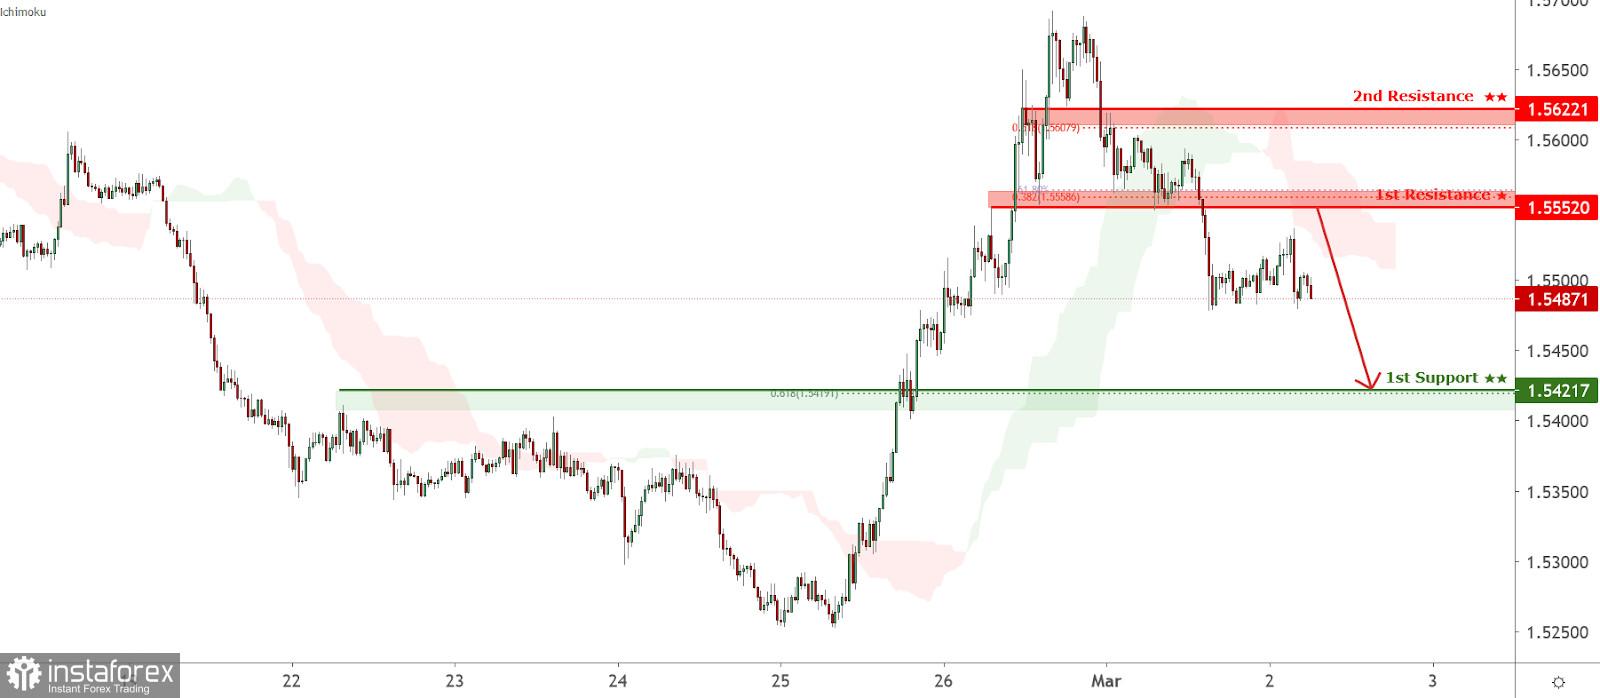 Pasangan mata wang EUR/AUD menghadapi tekanan menurun, pergerakan berpotensi untuk penurunan selanjutnya!